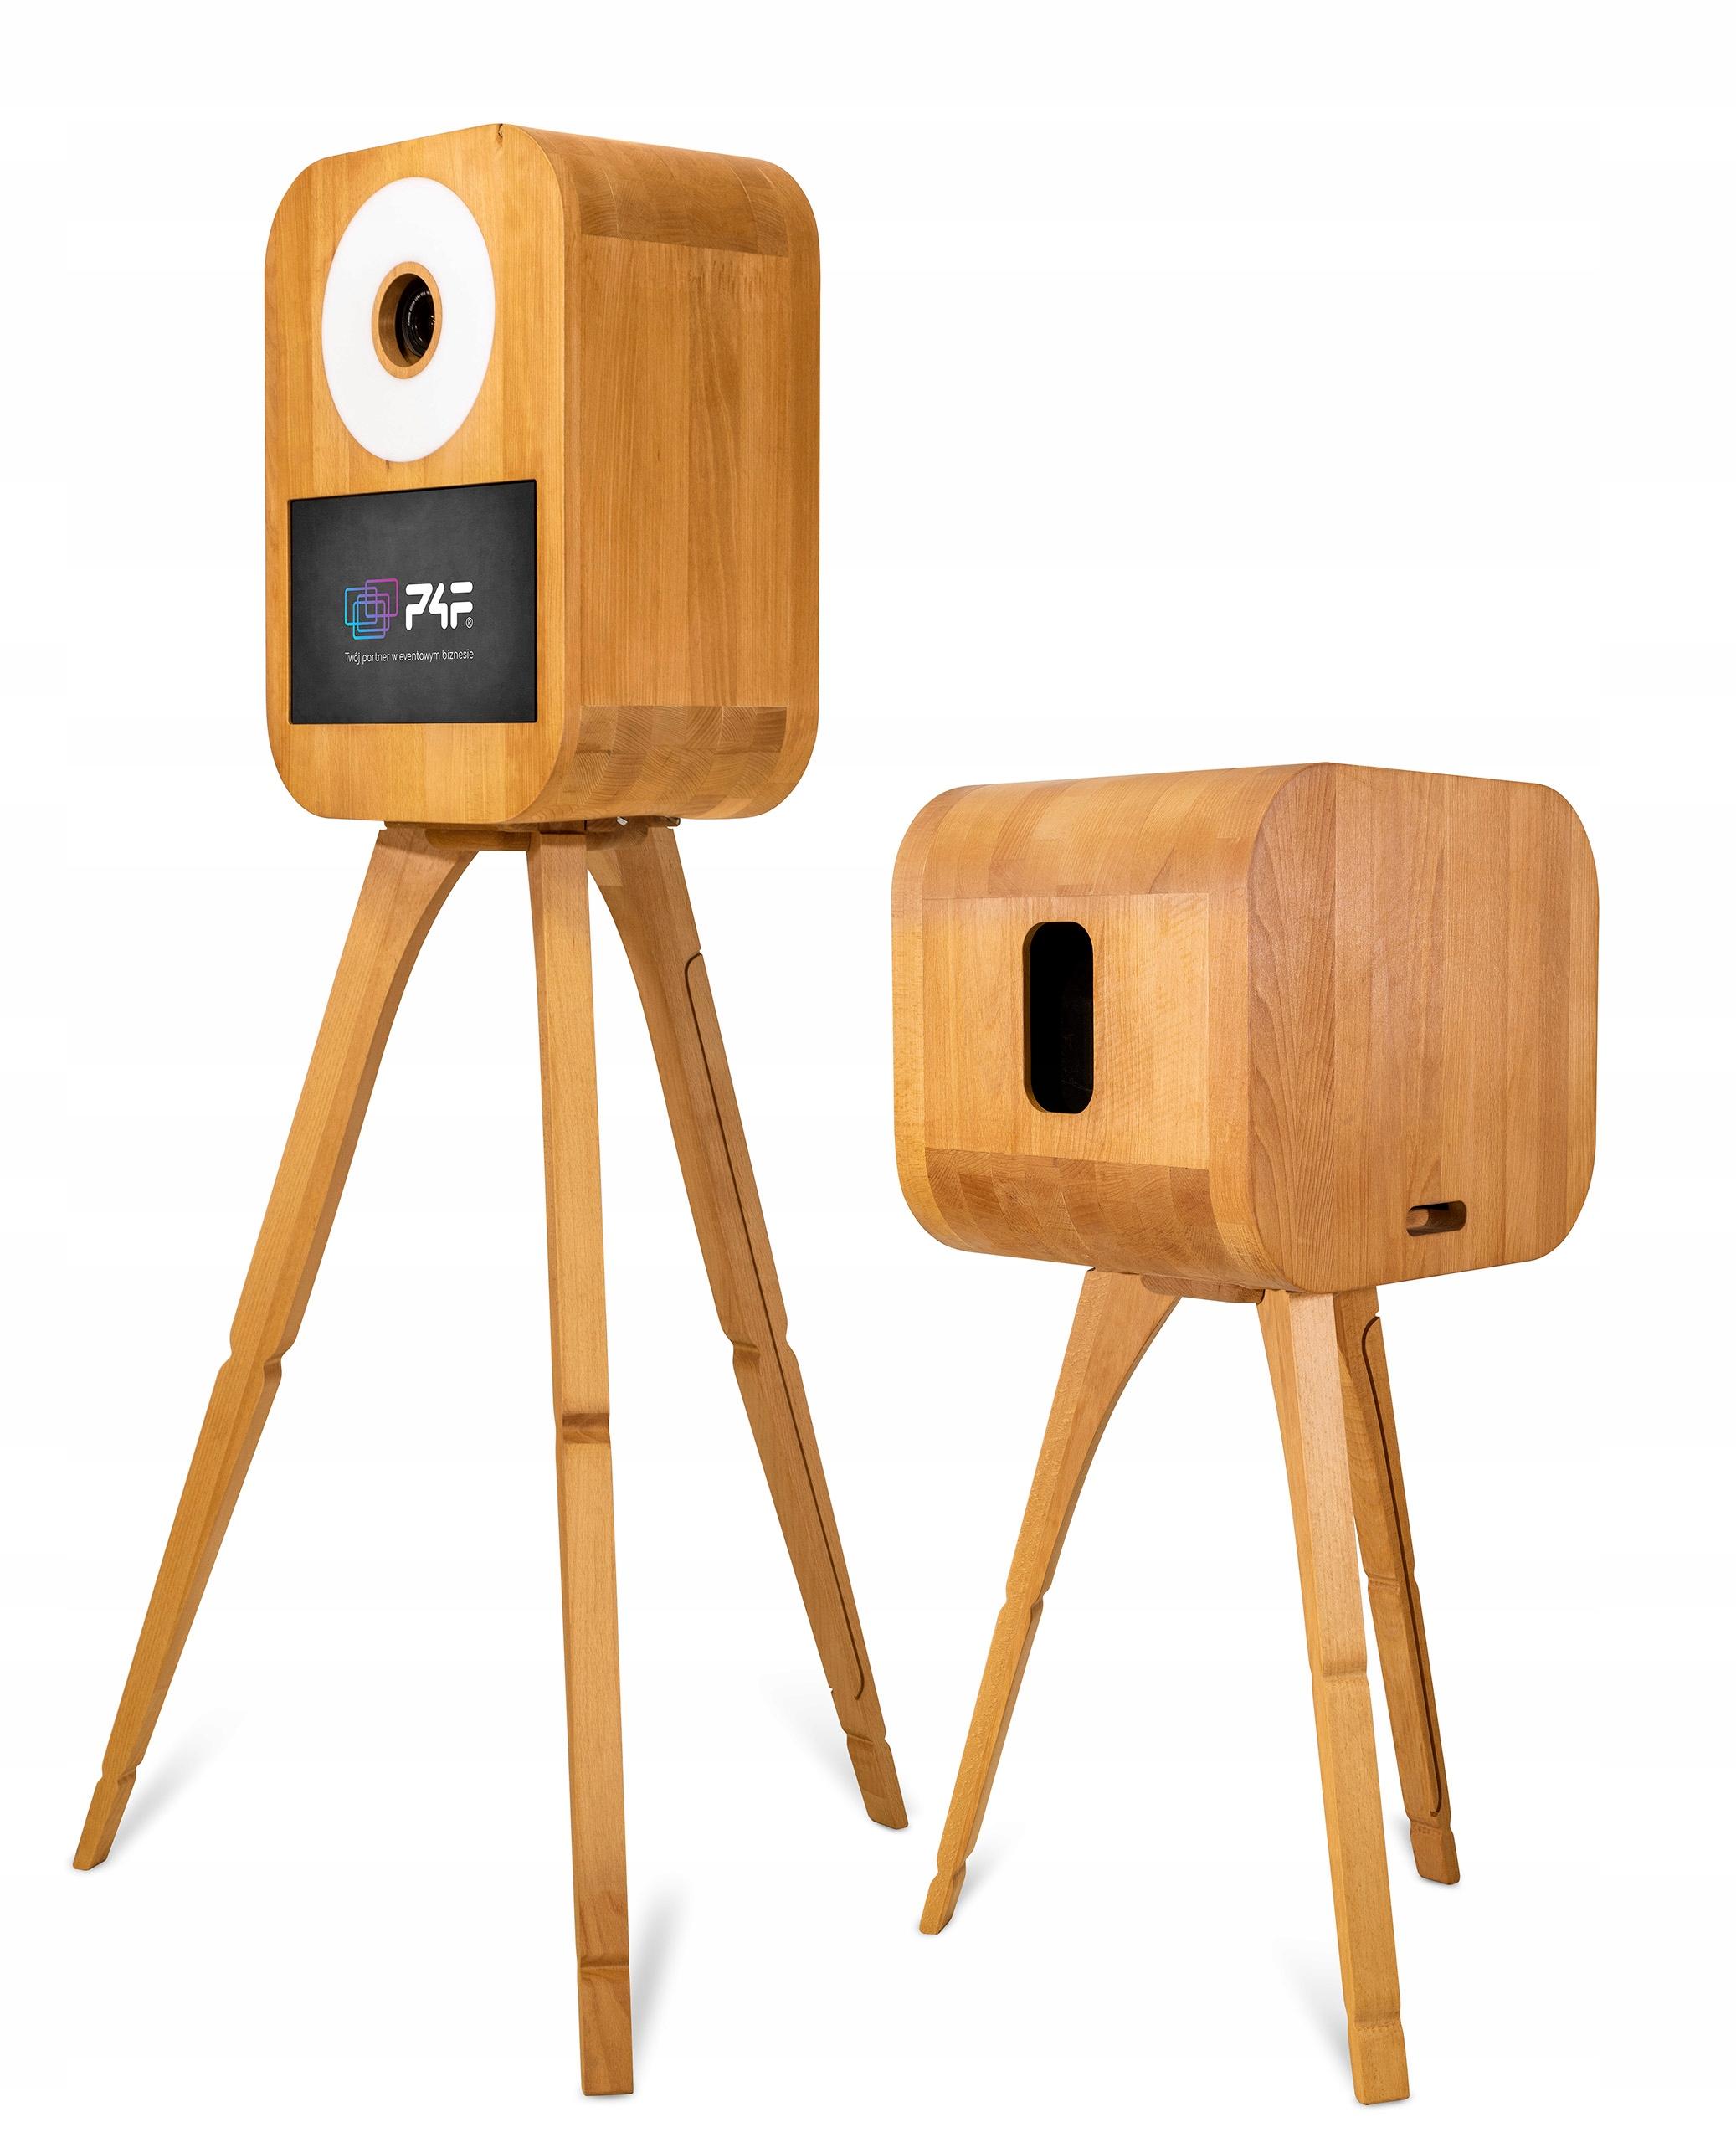 FOTOGRAFIA P4F RETRO S retro krabica vyrobená z dreva Full